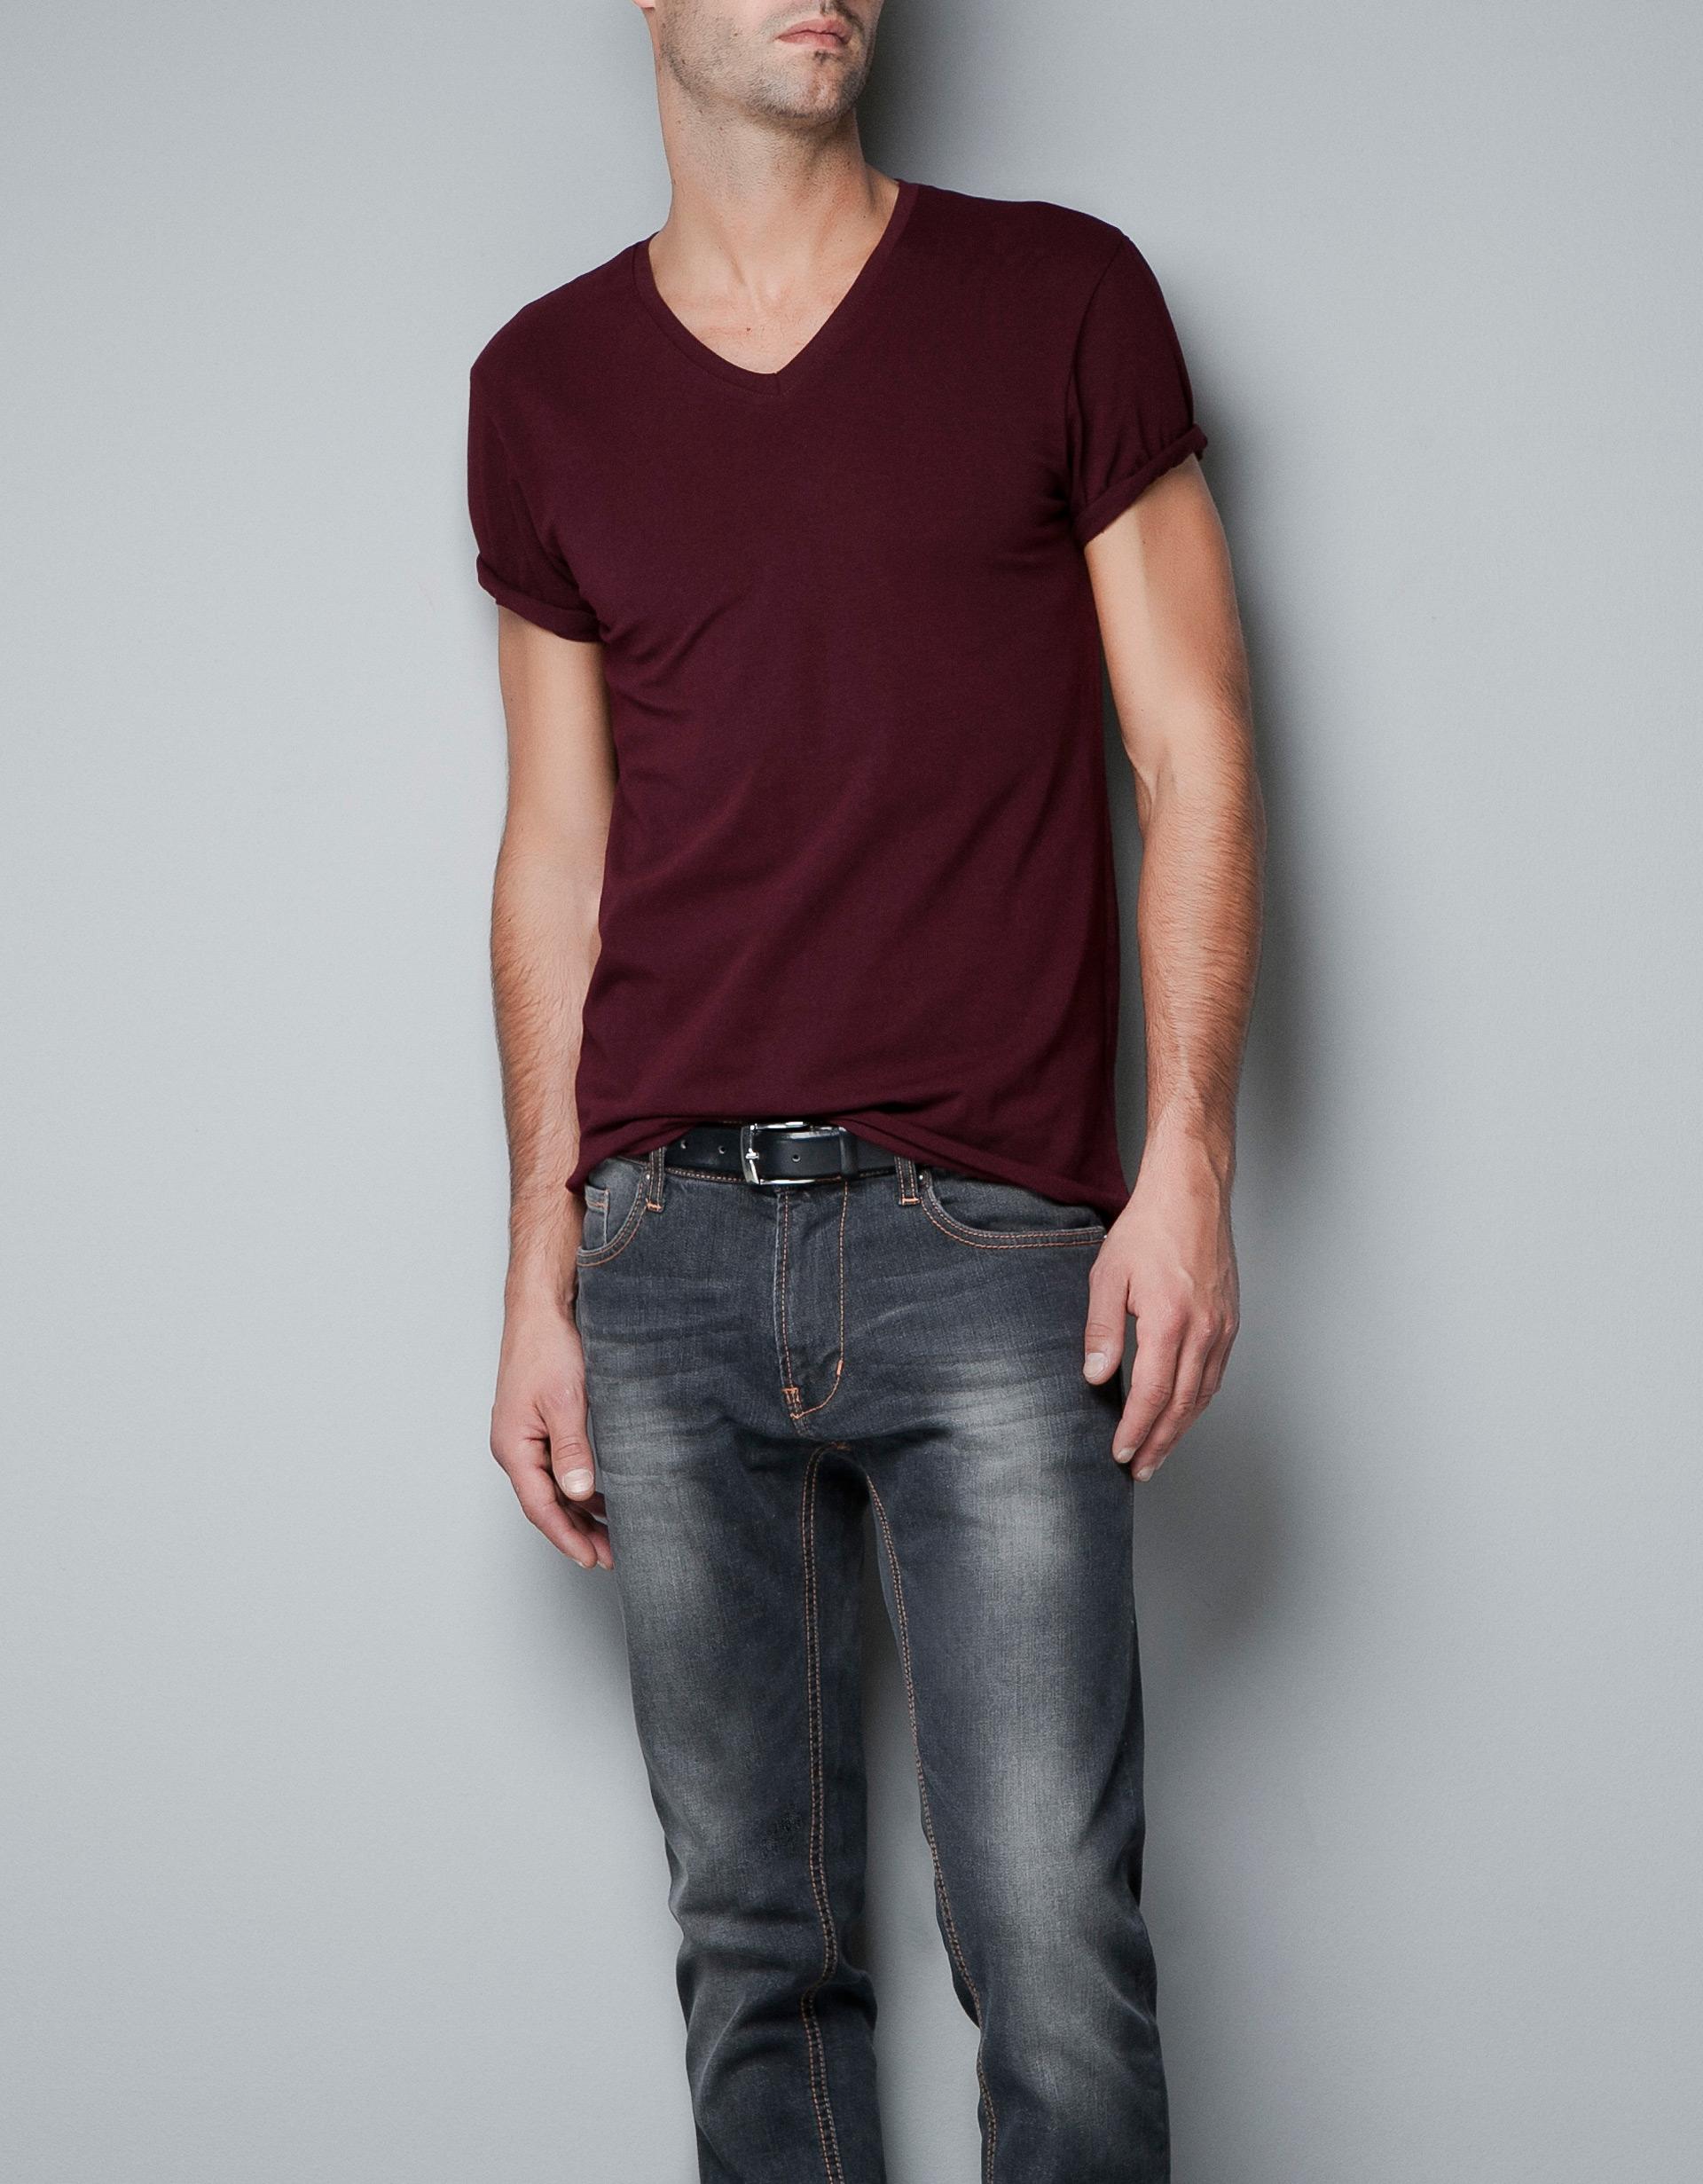 Zara Super Slim Fit T Shirt In Red For Men Lyst